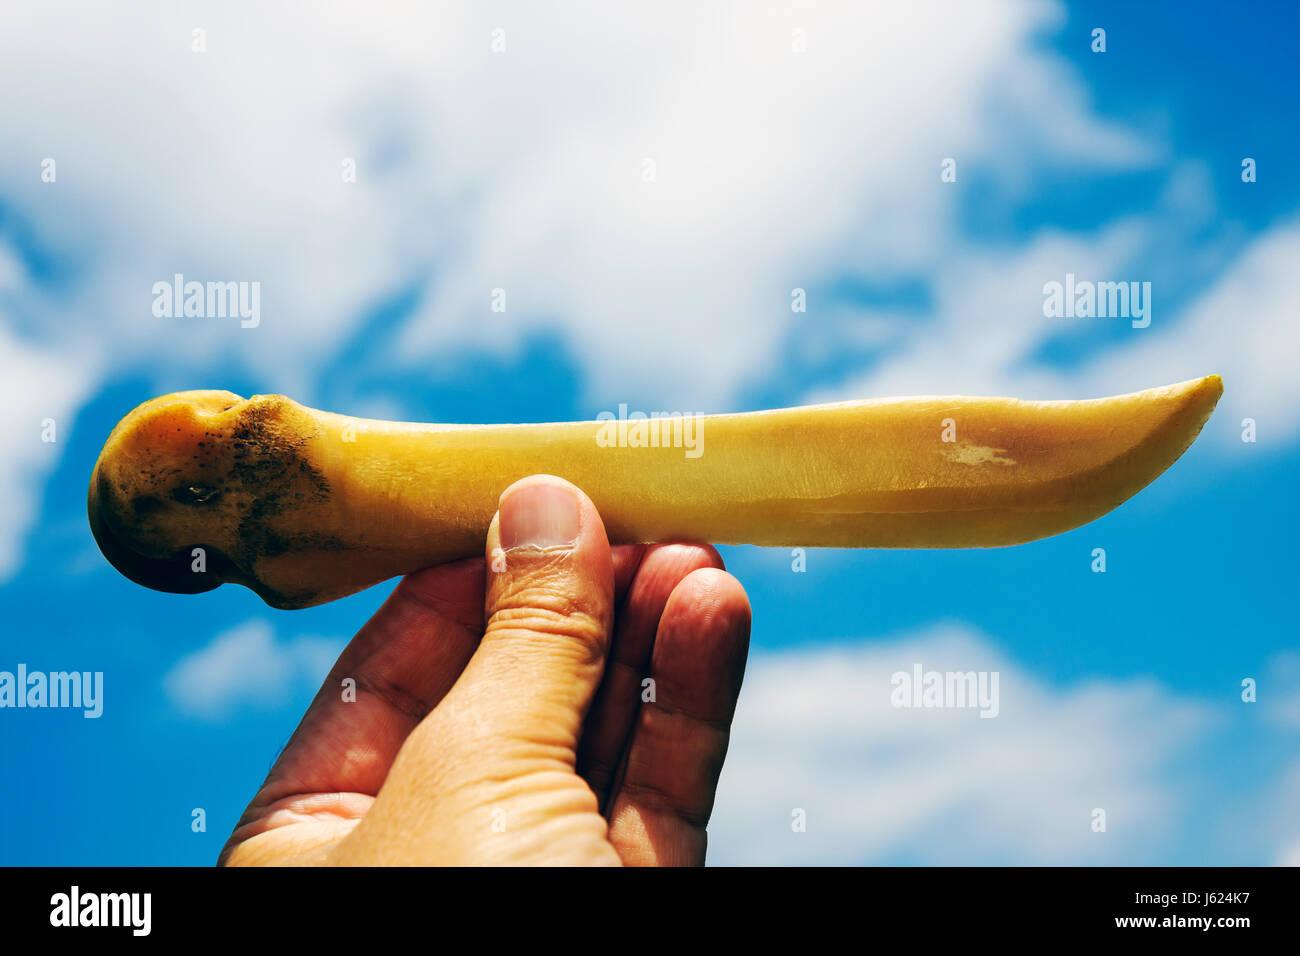 Indiana Valparaiso Wheeler Broken Wagon Bison knife carved bone ranch farm artifact tool implement - Stock Image